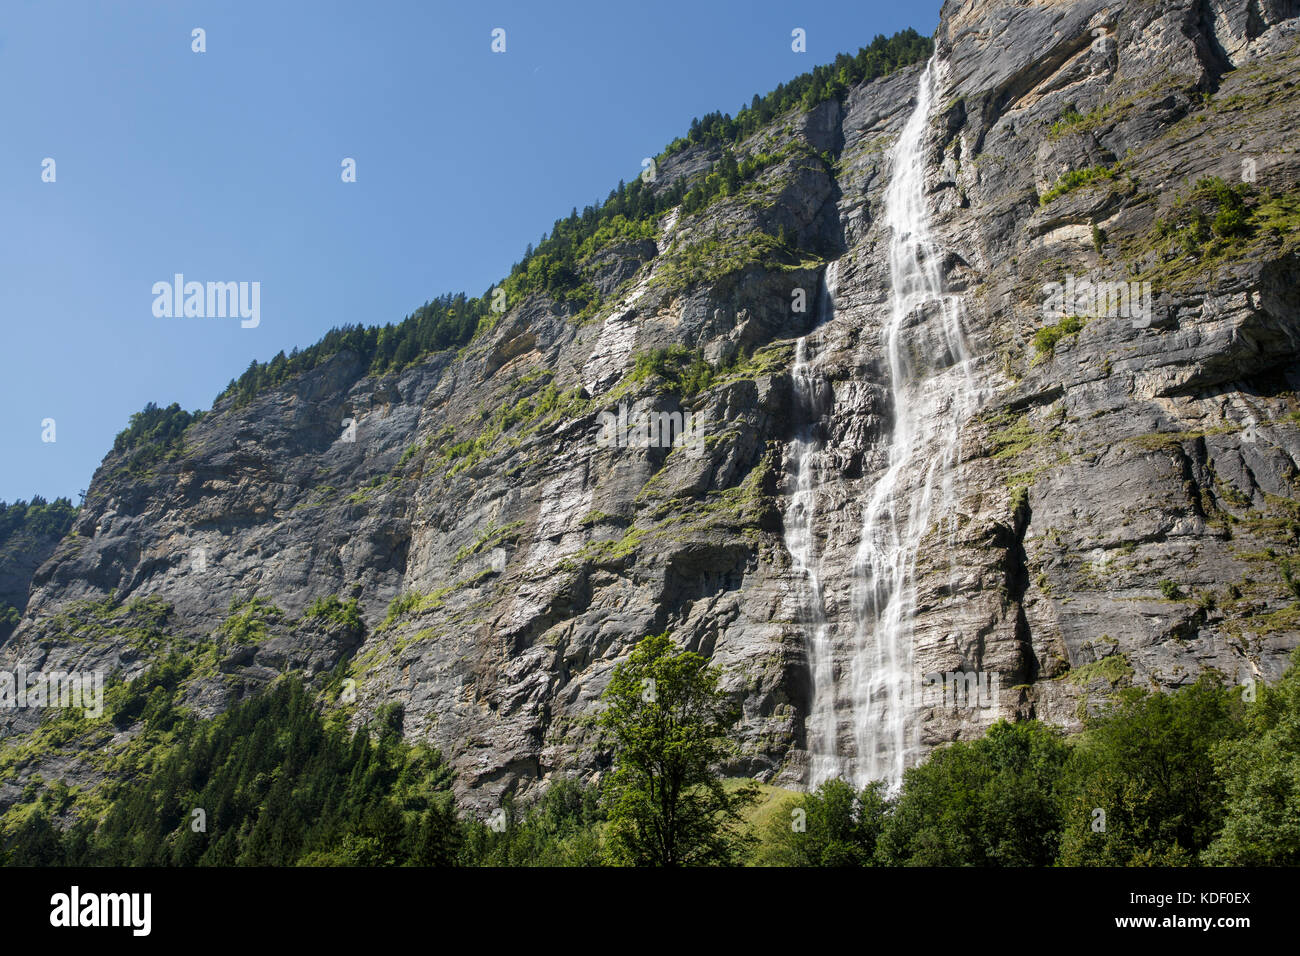 Mürrenbachfall, Lauterbrunnen, Switzerland - Stock Image